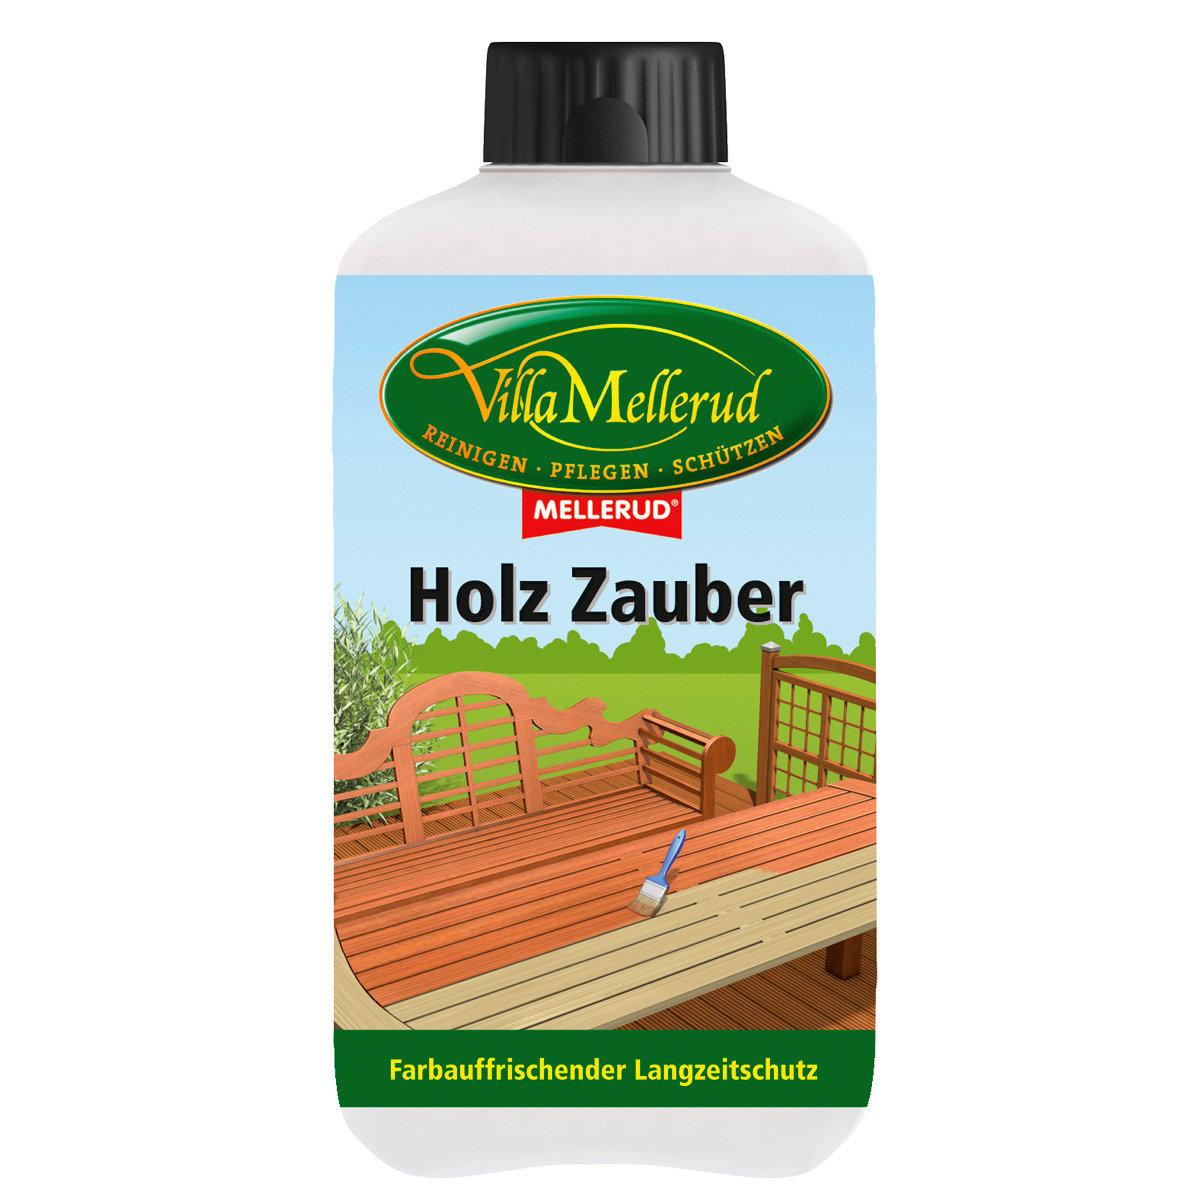 Holz-Zauber, 1,0 Liter